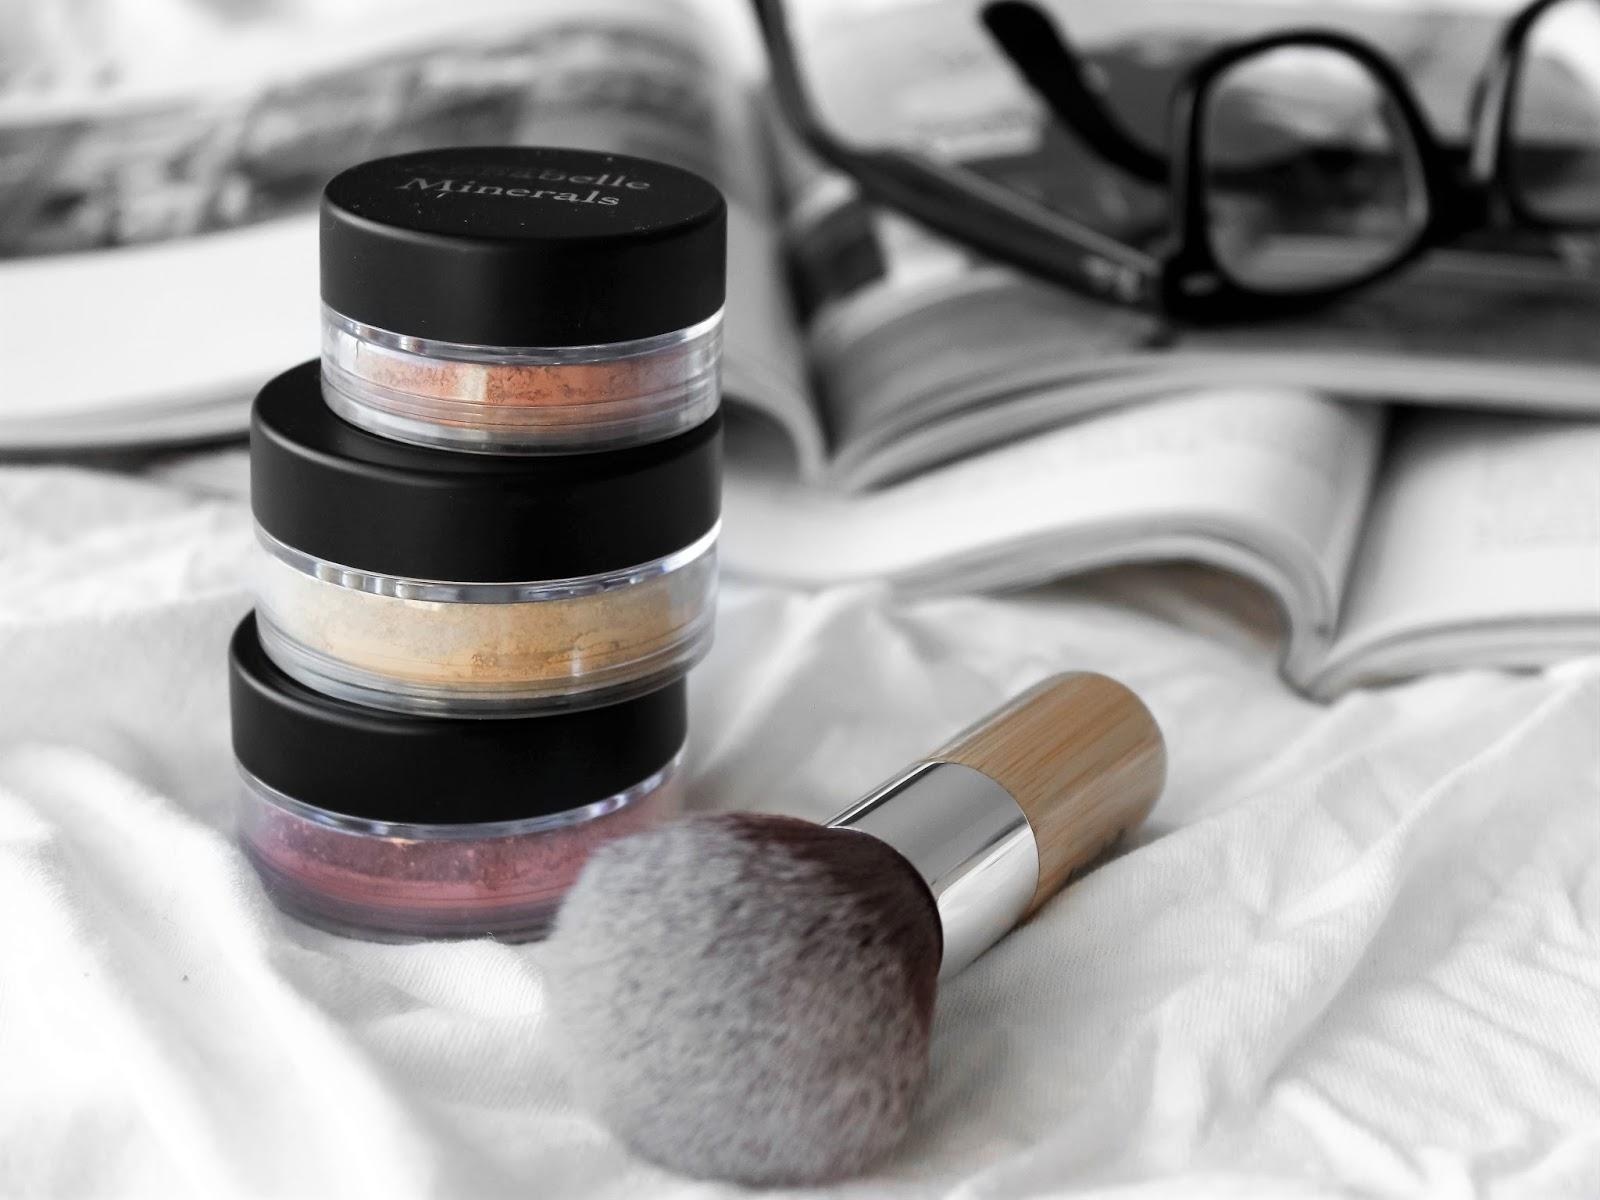 minerální makeup annabelle minerals